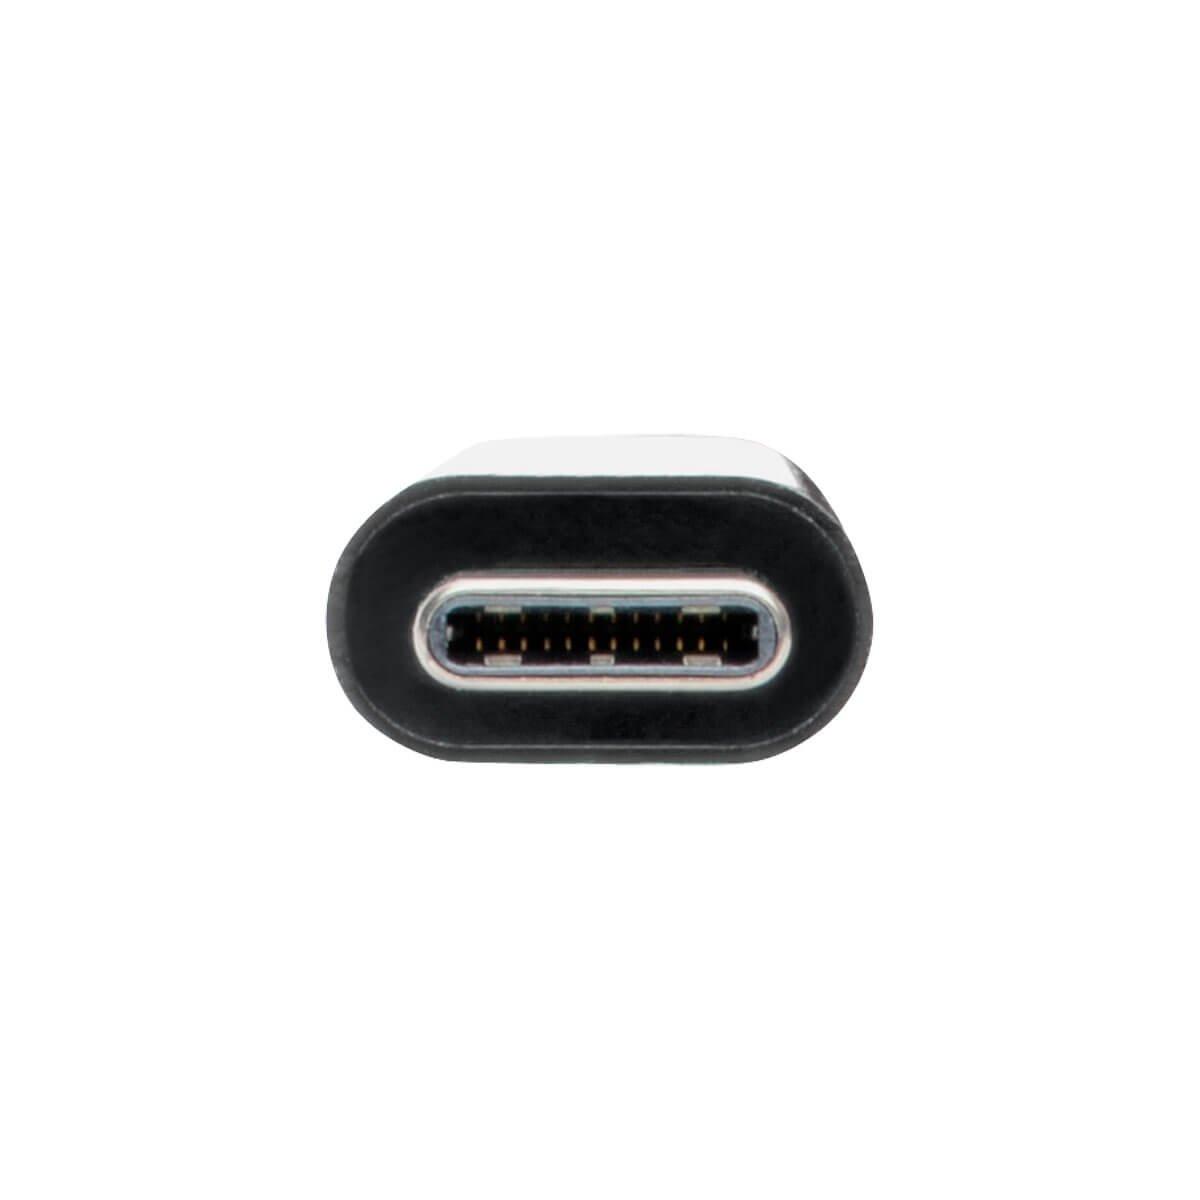 Tripp Lite USB C to DVI Adapter Converter w/ PD Charging